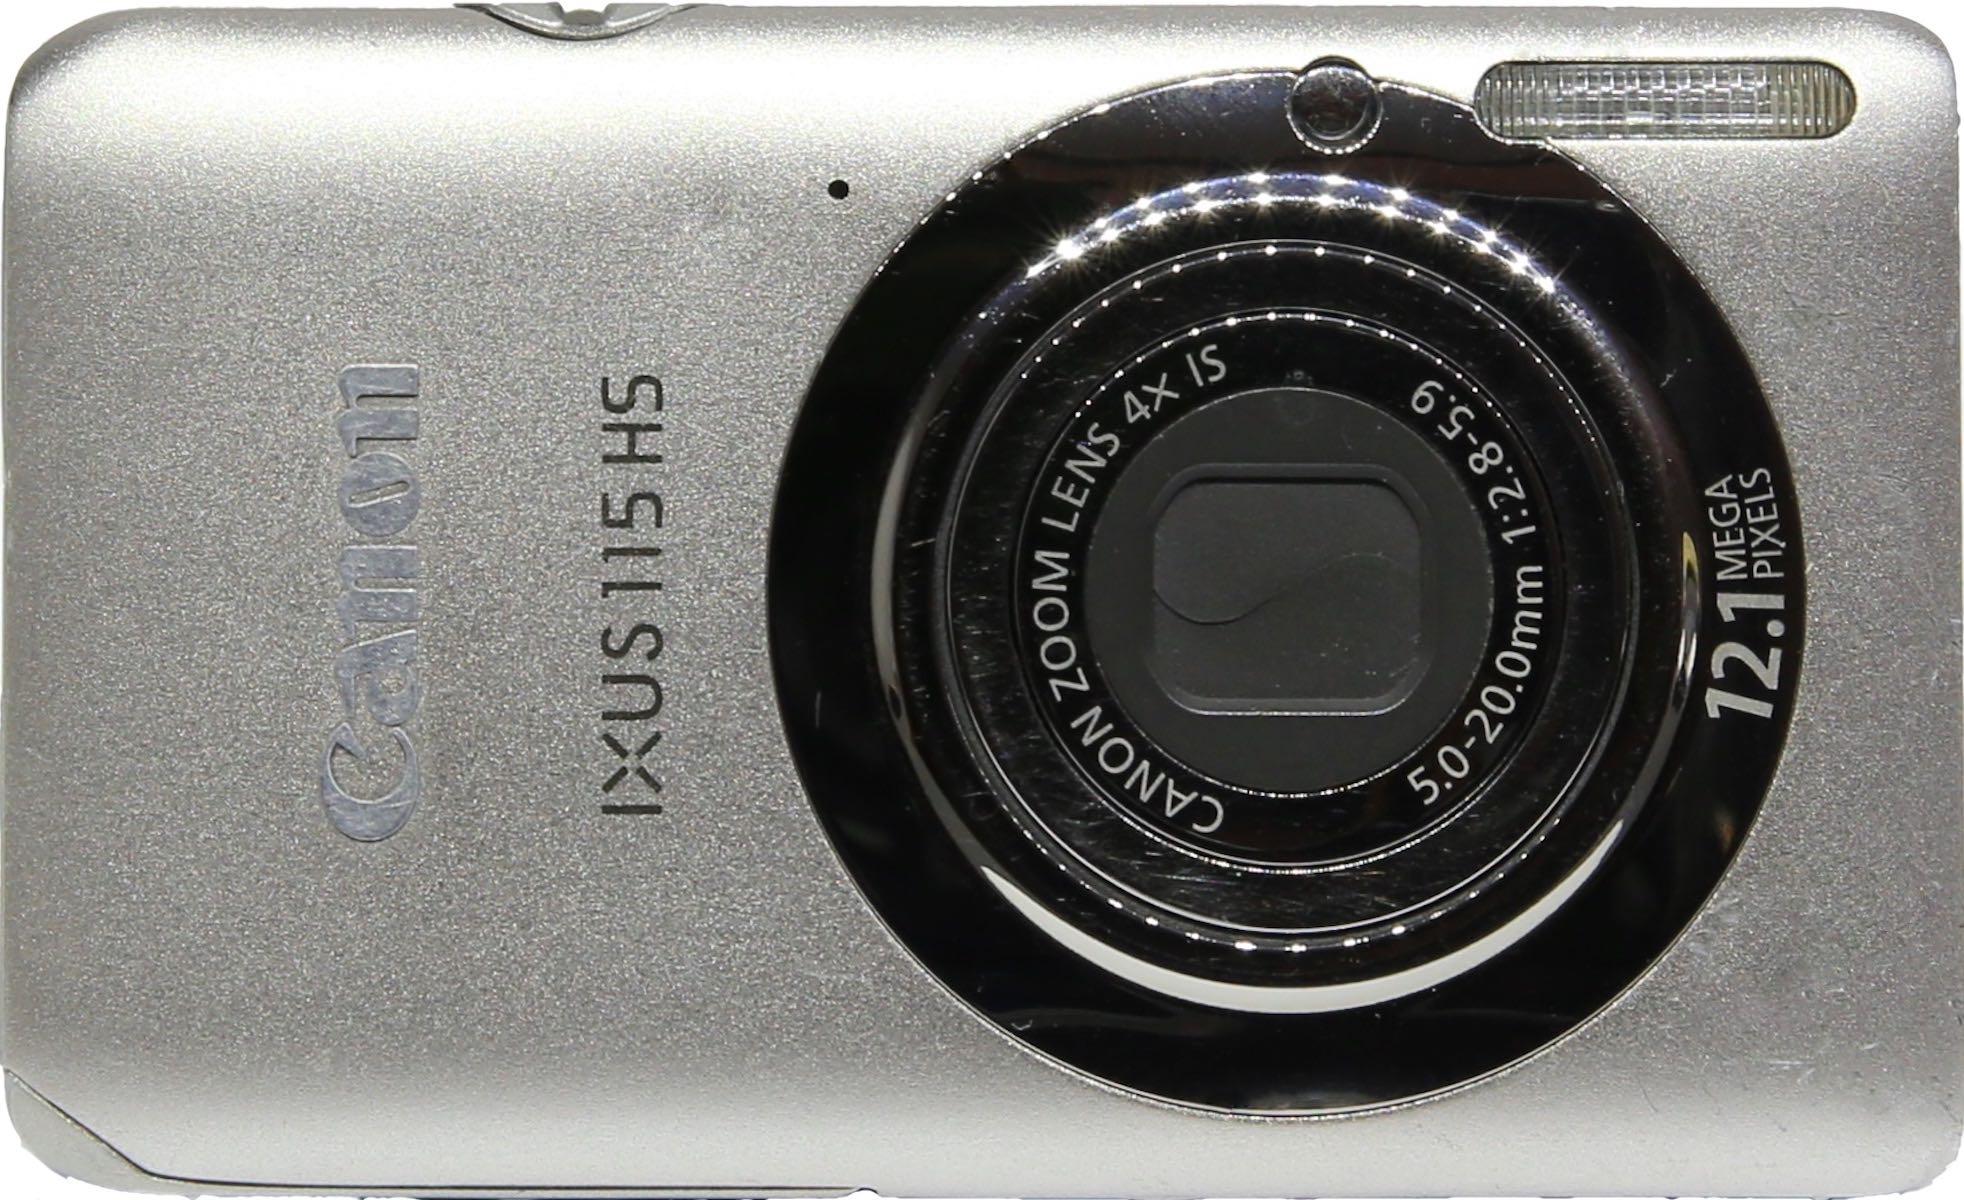 Ixus 115 HS